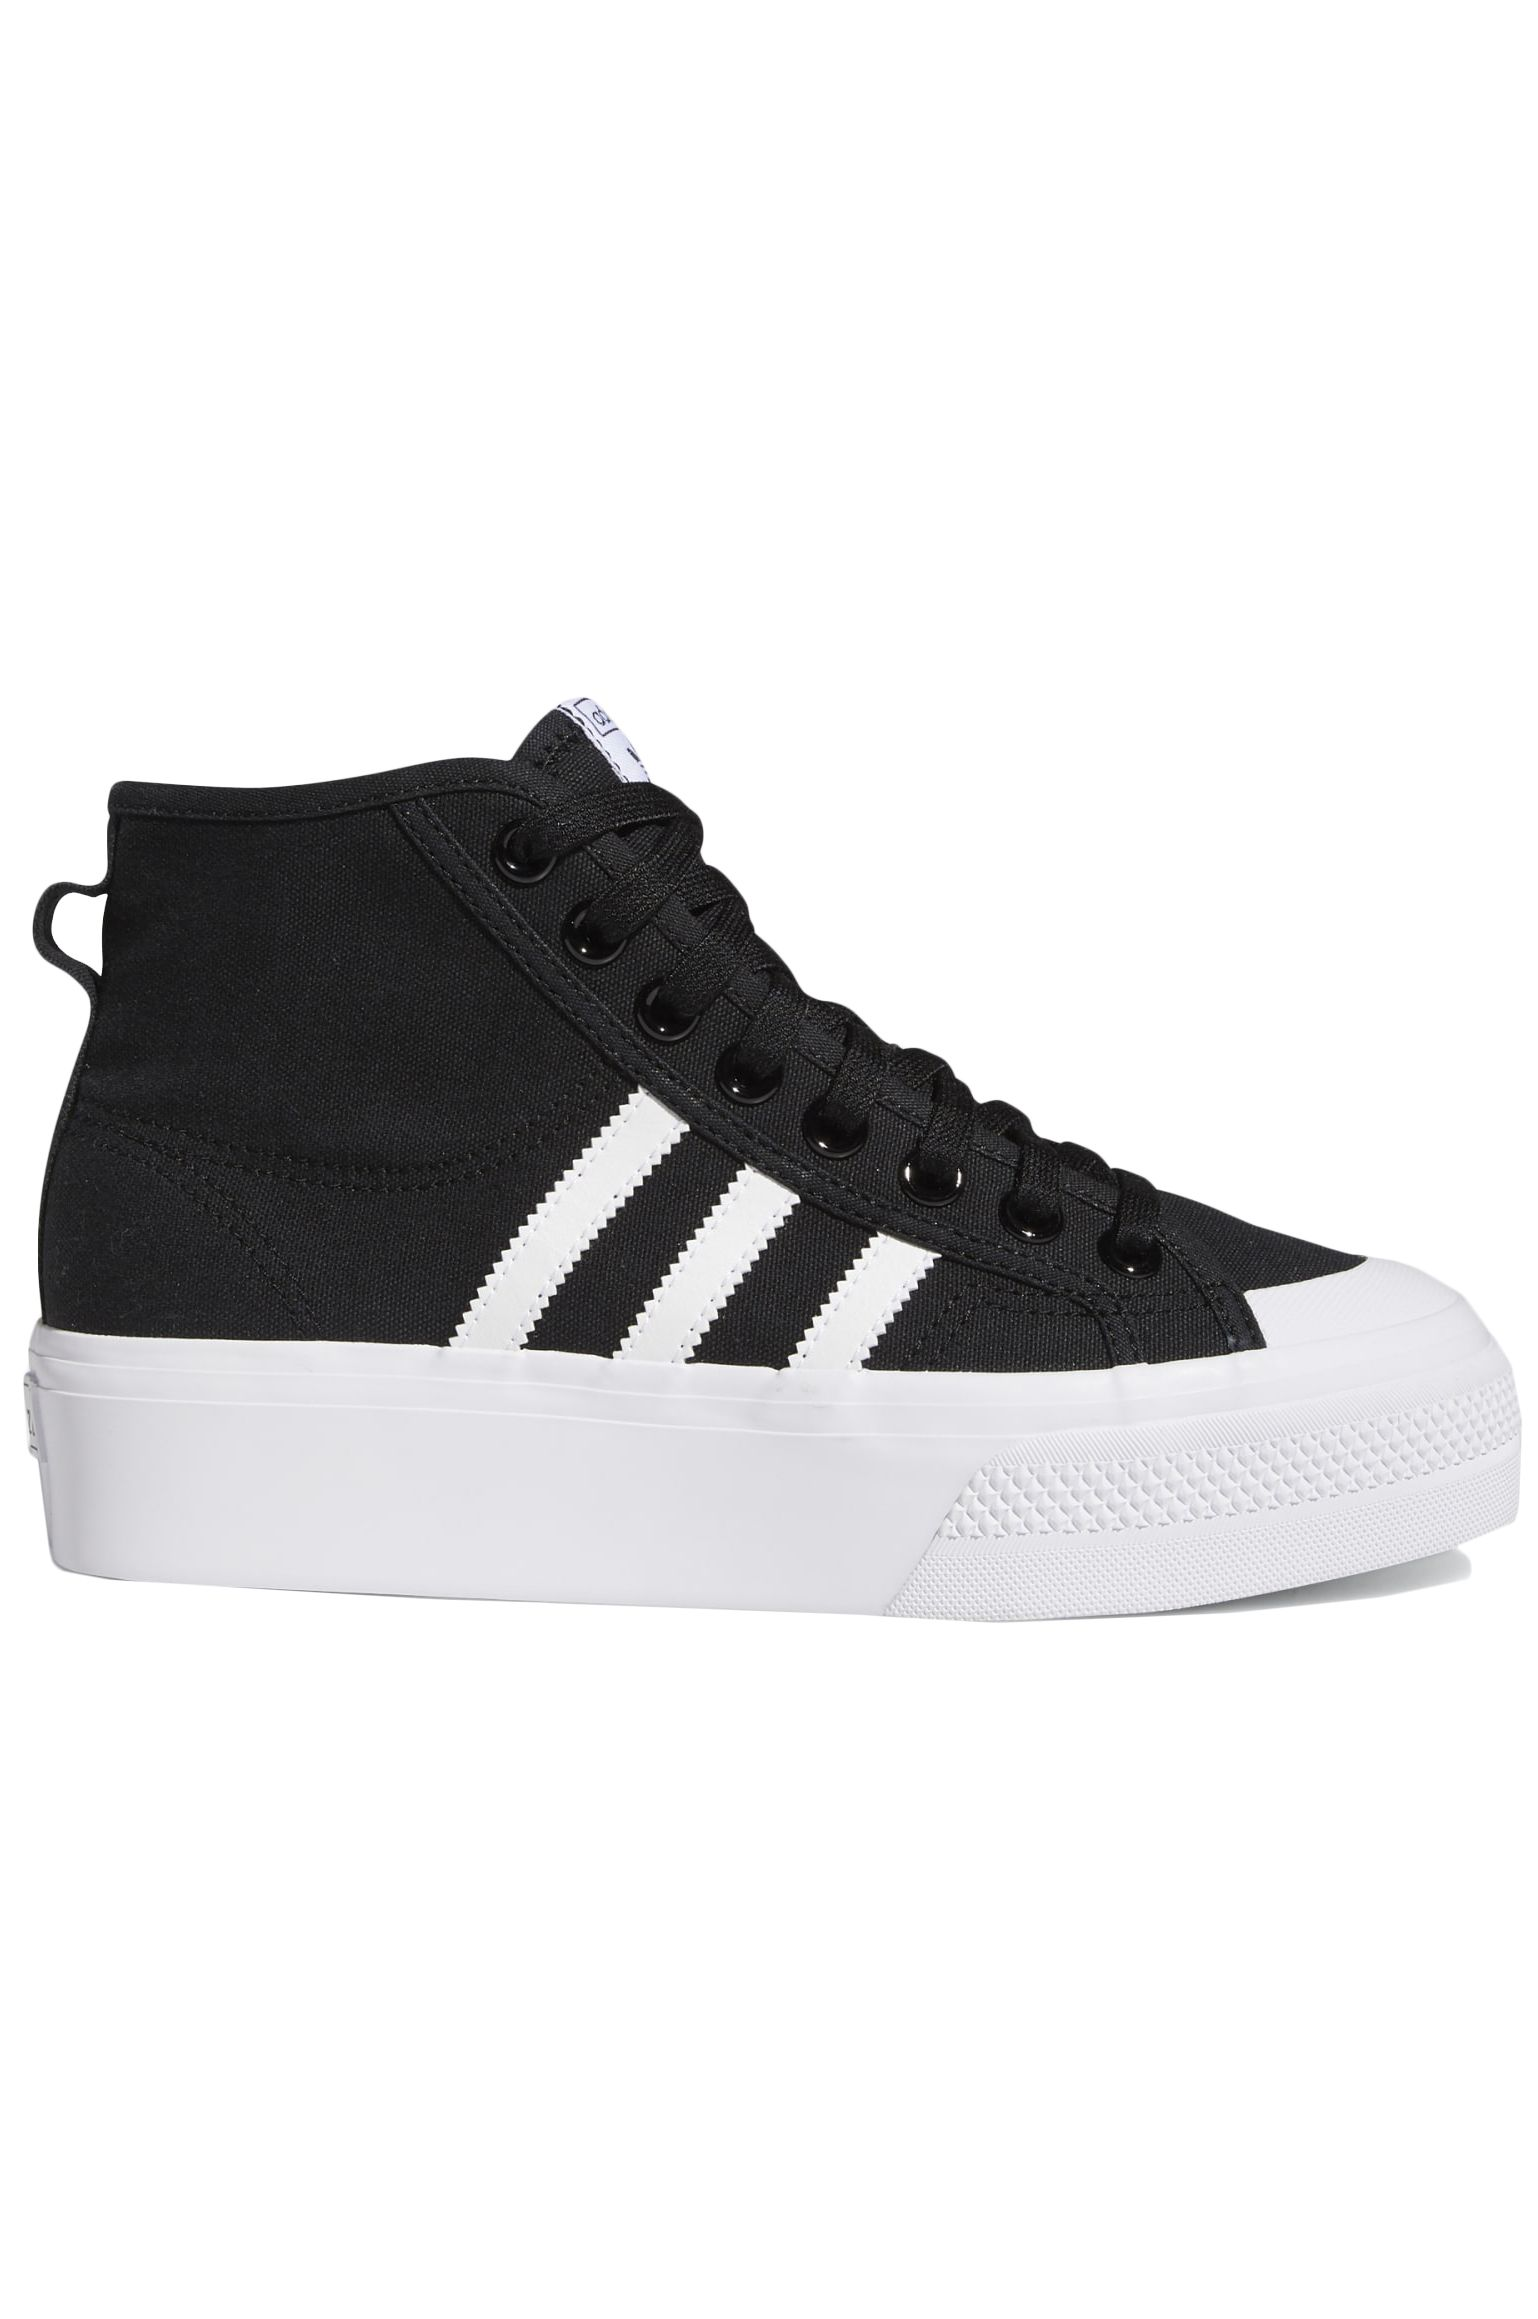 Tenis Adidas NIZZA PLATFORM MID W Core Black/Ftwr White/Ftwr White